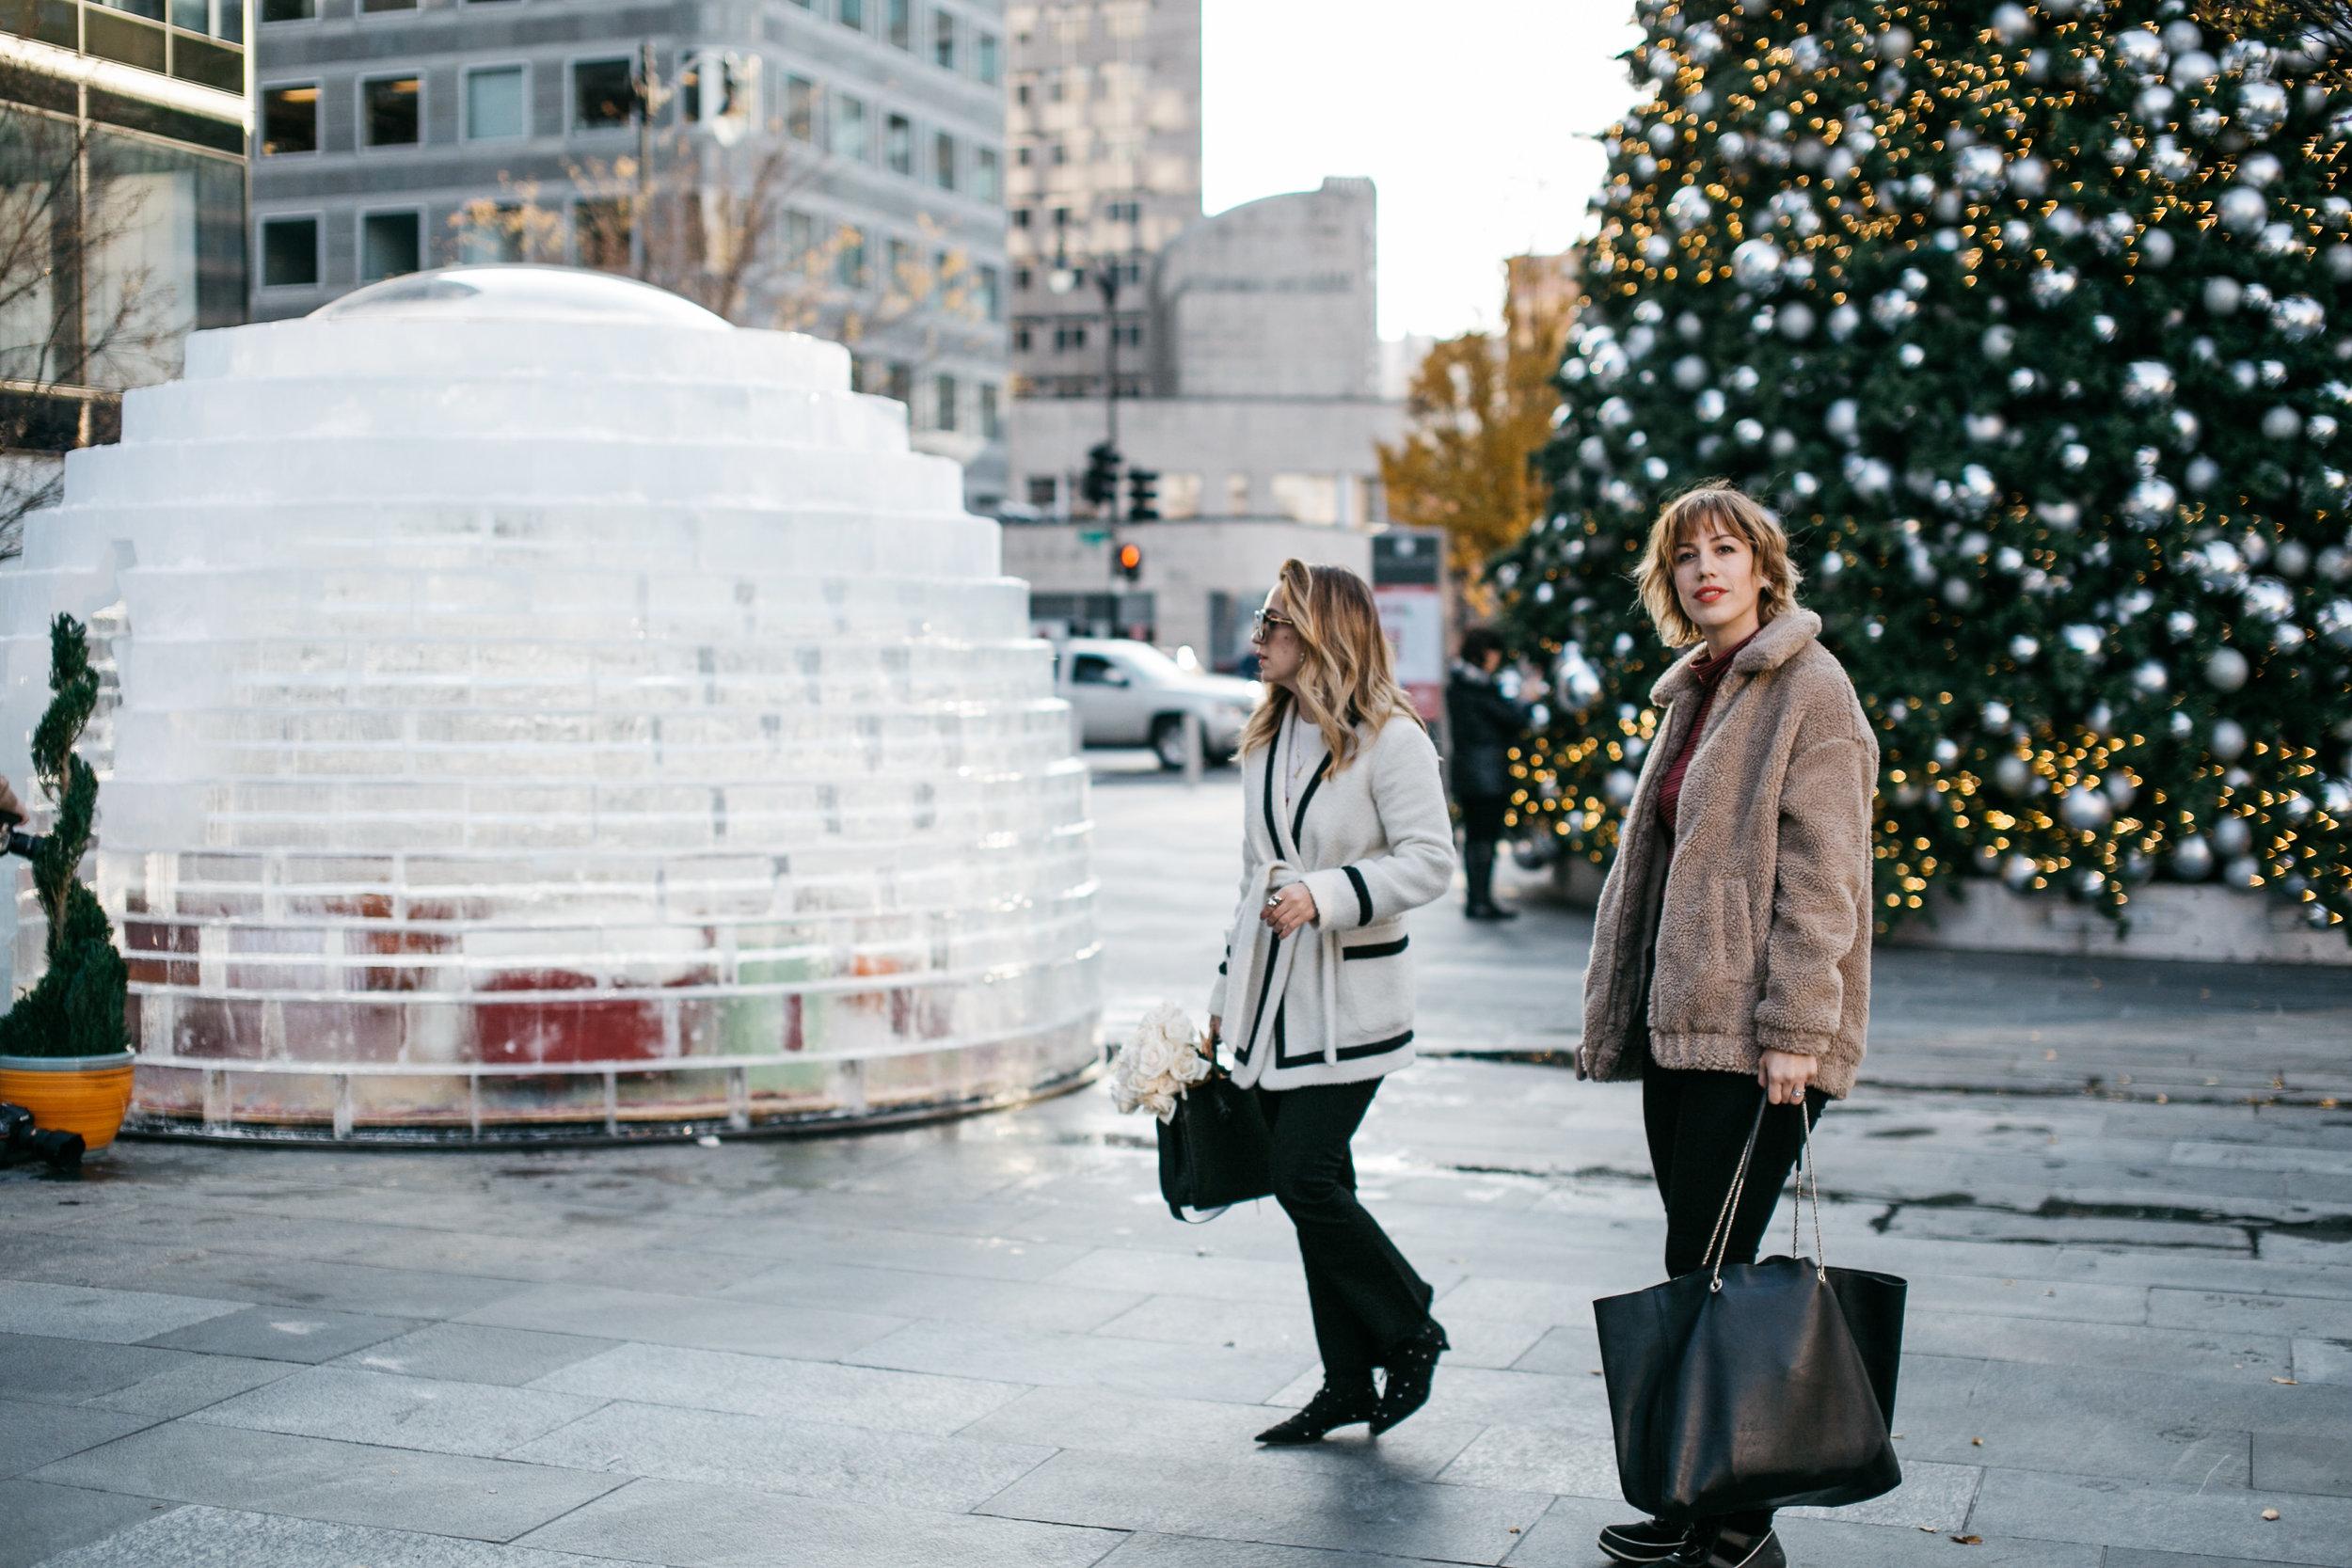 City-Center-Igloo-2.jpg